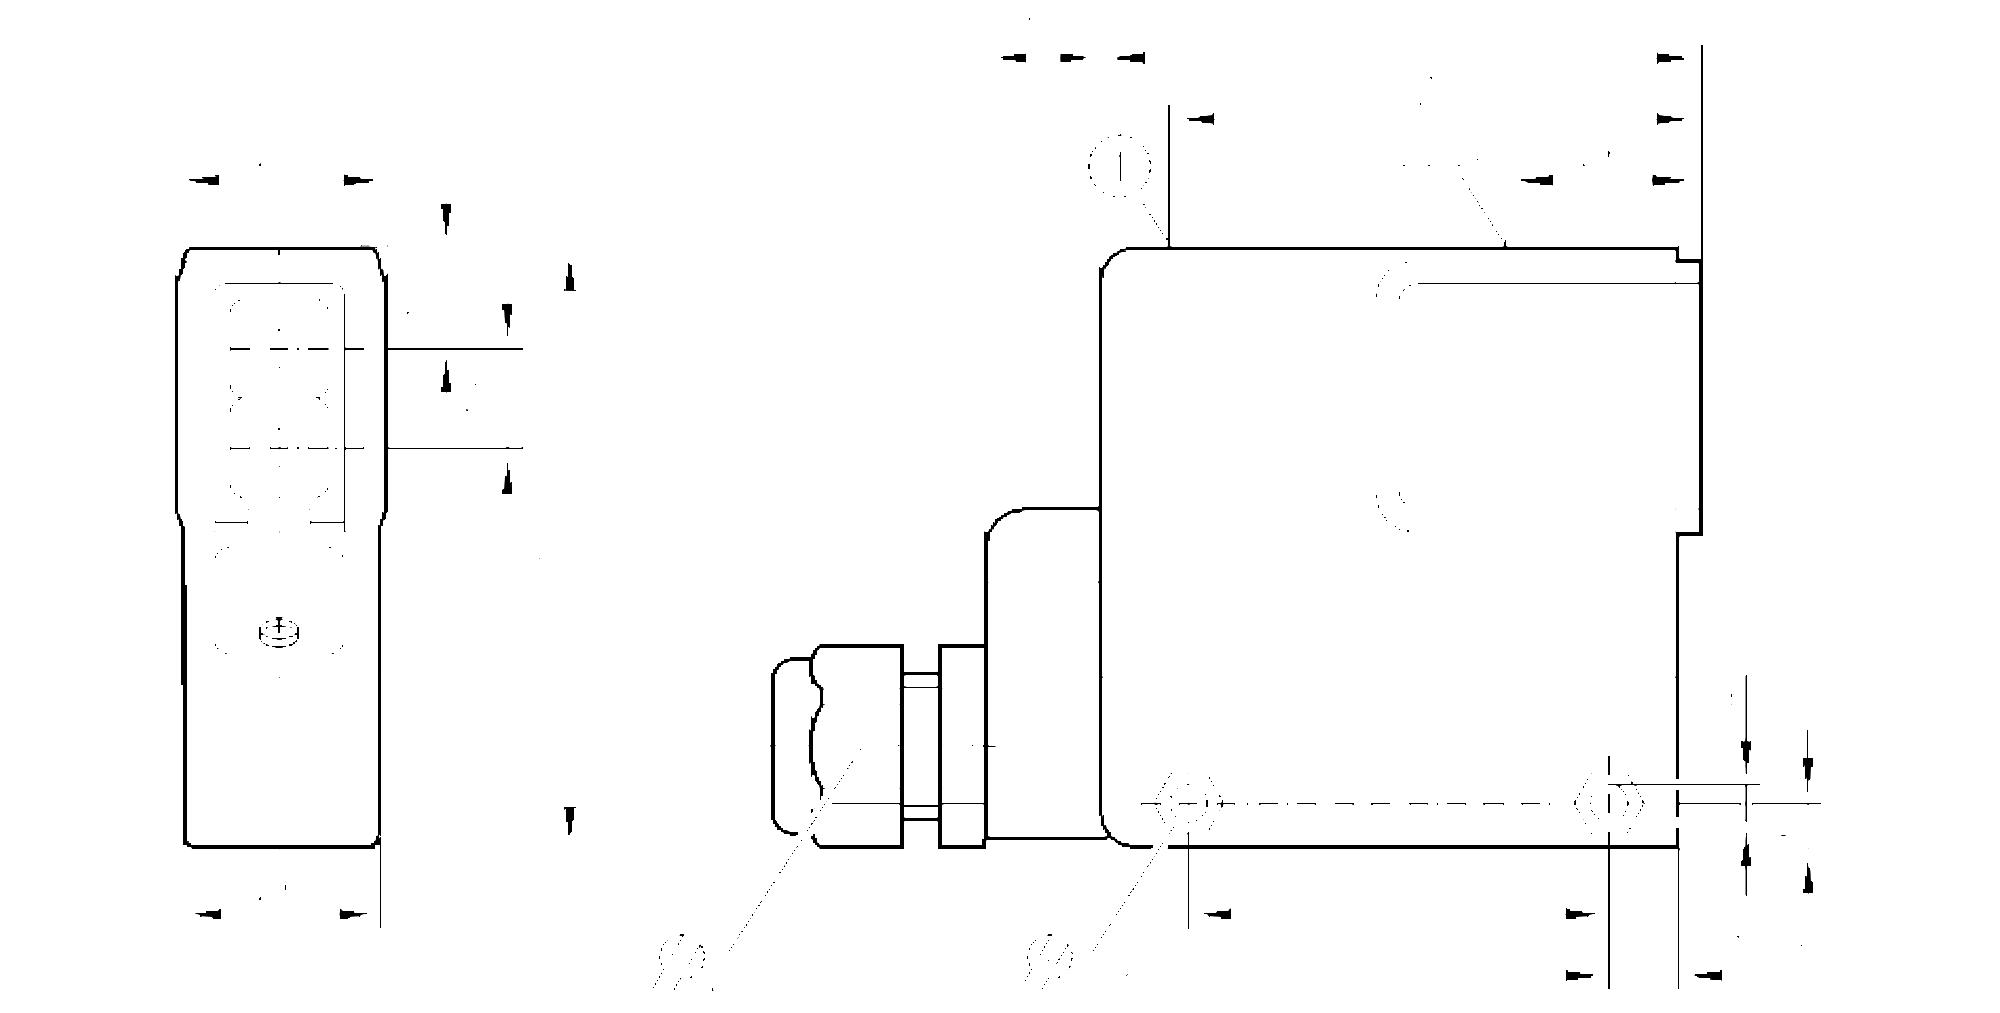 os5029 - diffuse reflection sensor